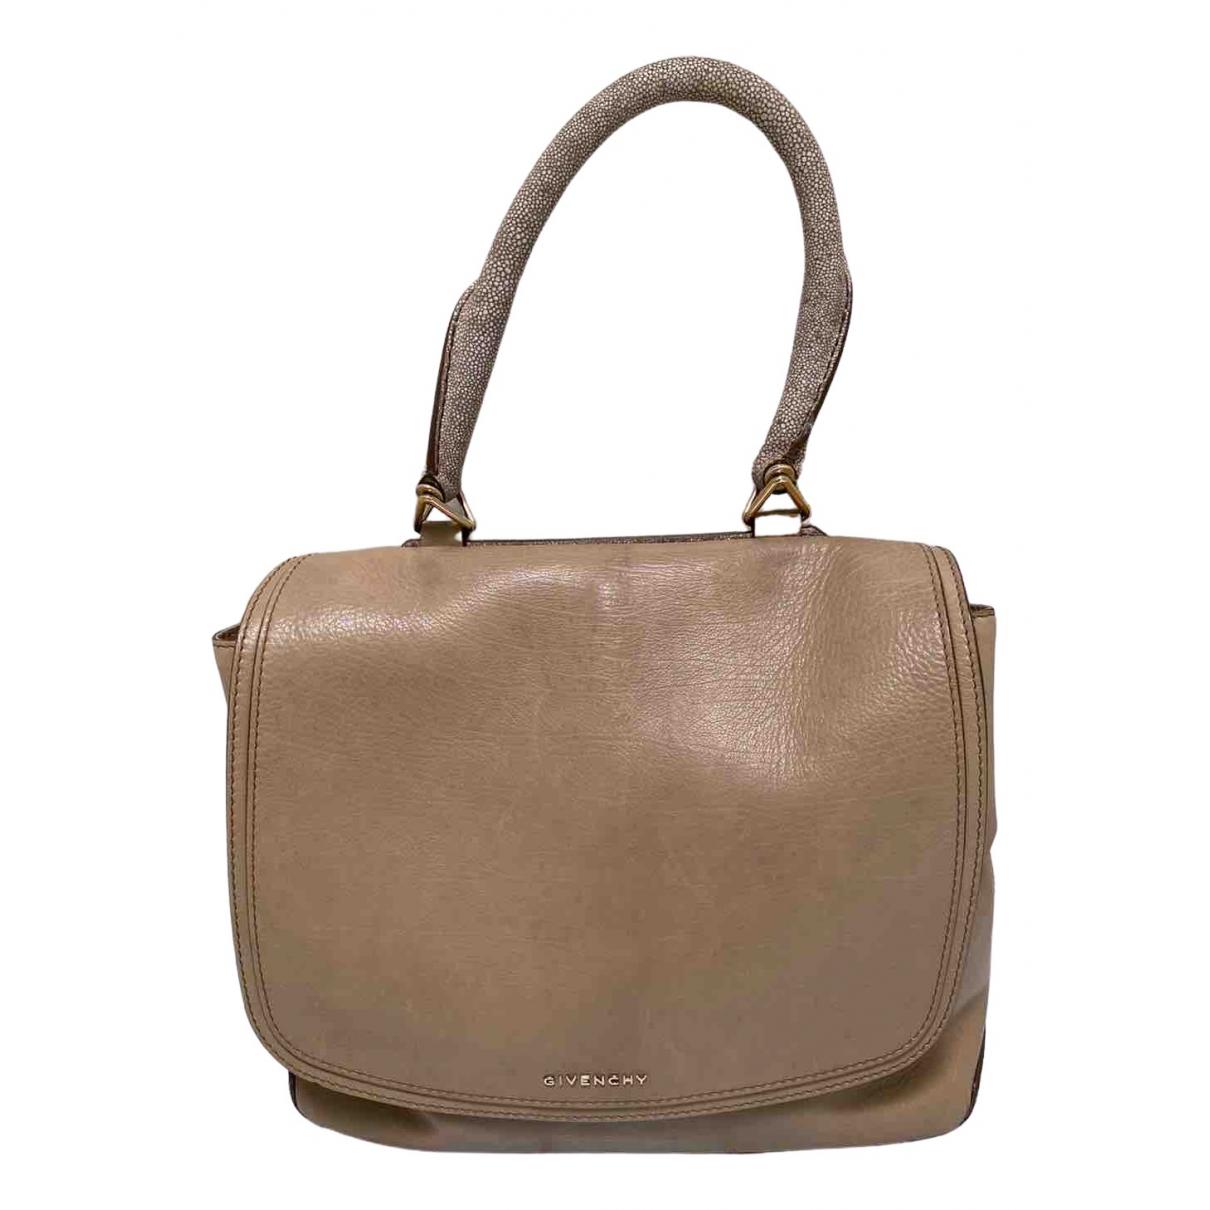 Givenchy \N Beige Leather handbag for Women \N